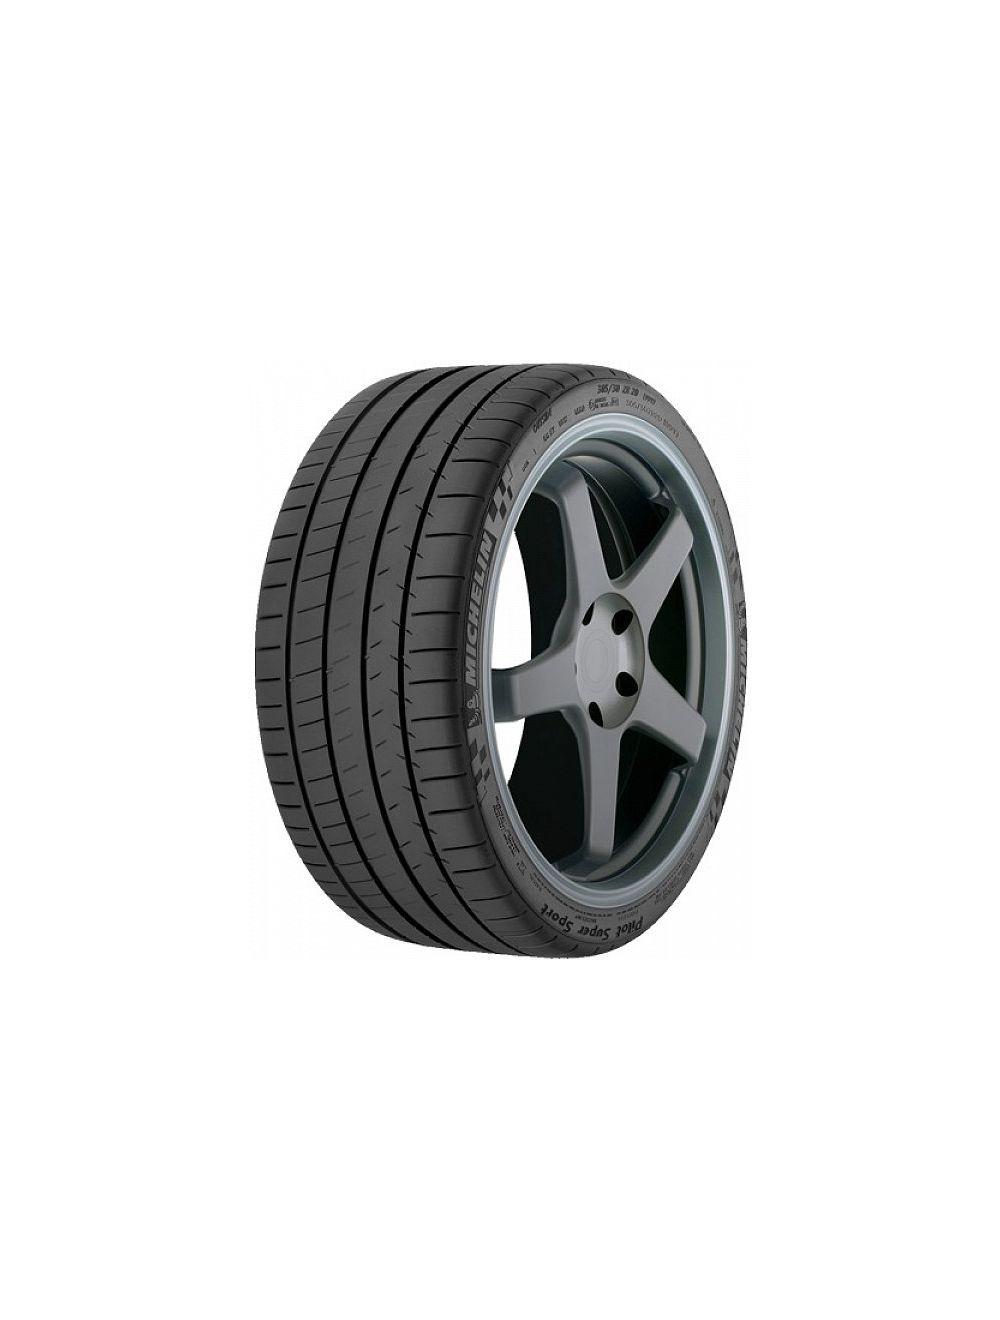 Michelin 265/30R20 Y Pilot Super Sport XL * Nyári gumi